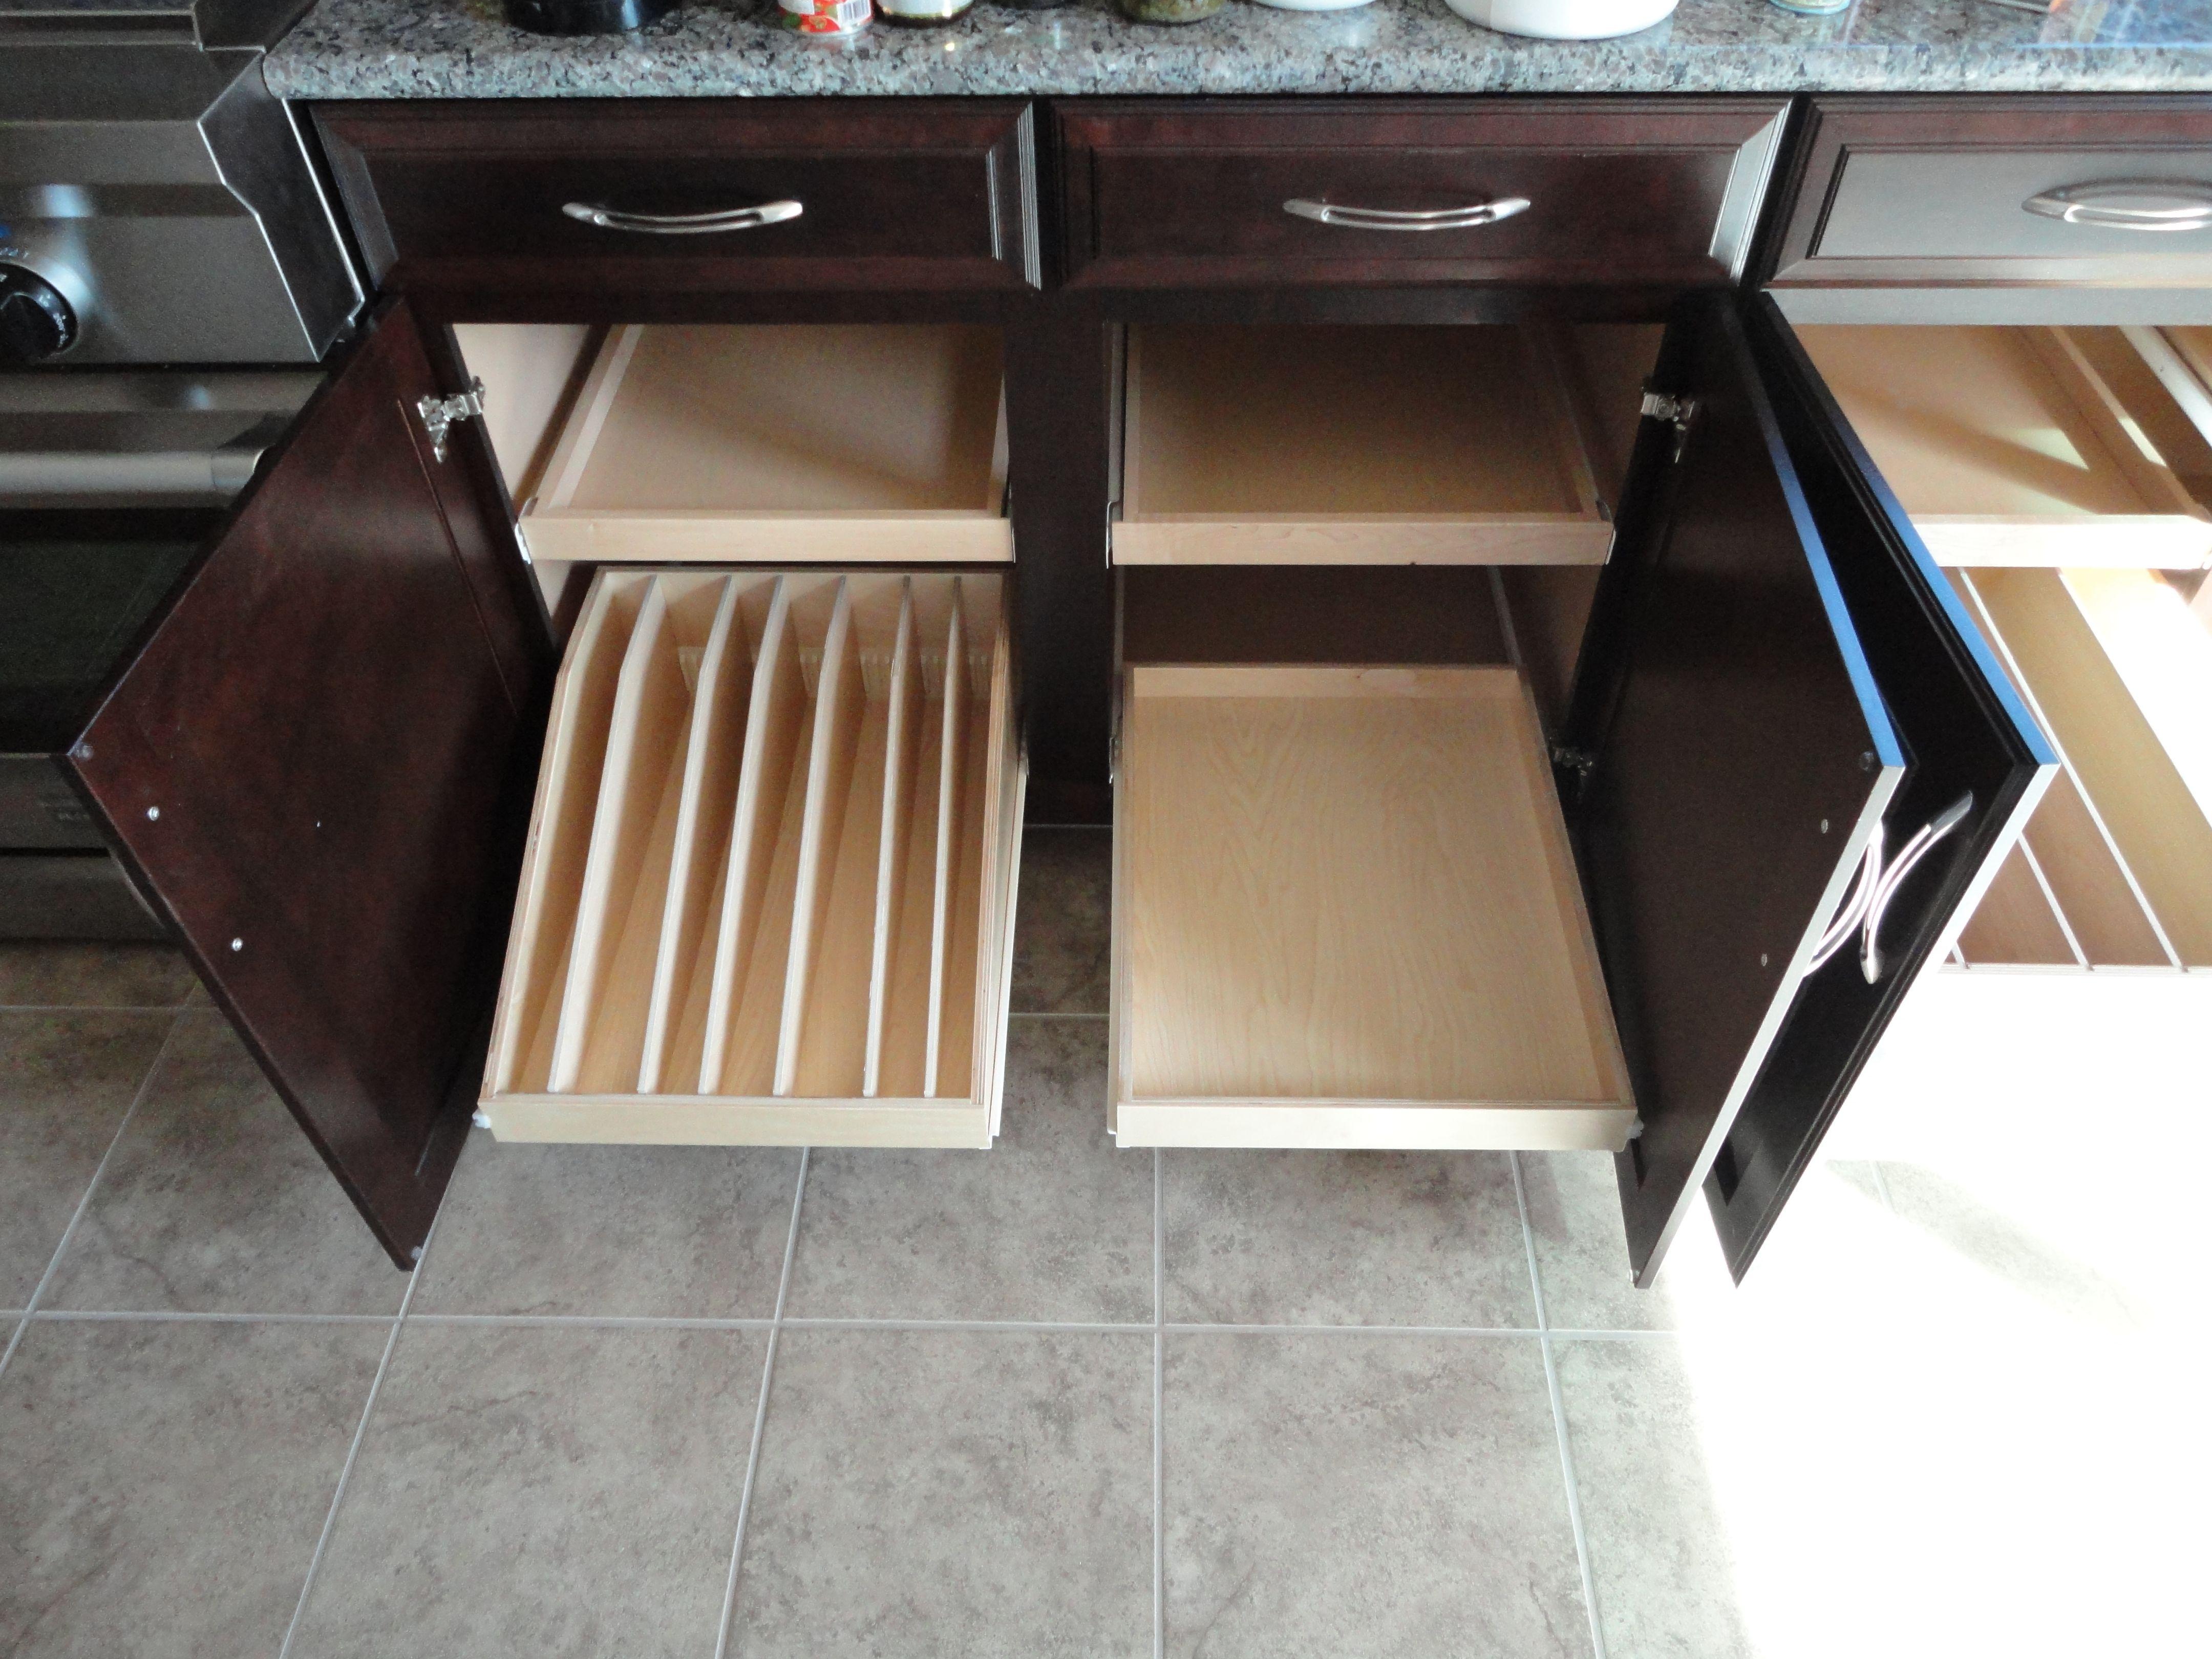 Pan Lid Pull Out Shelf Organizer Sliding Shelves Cupboard